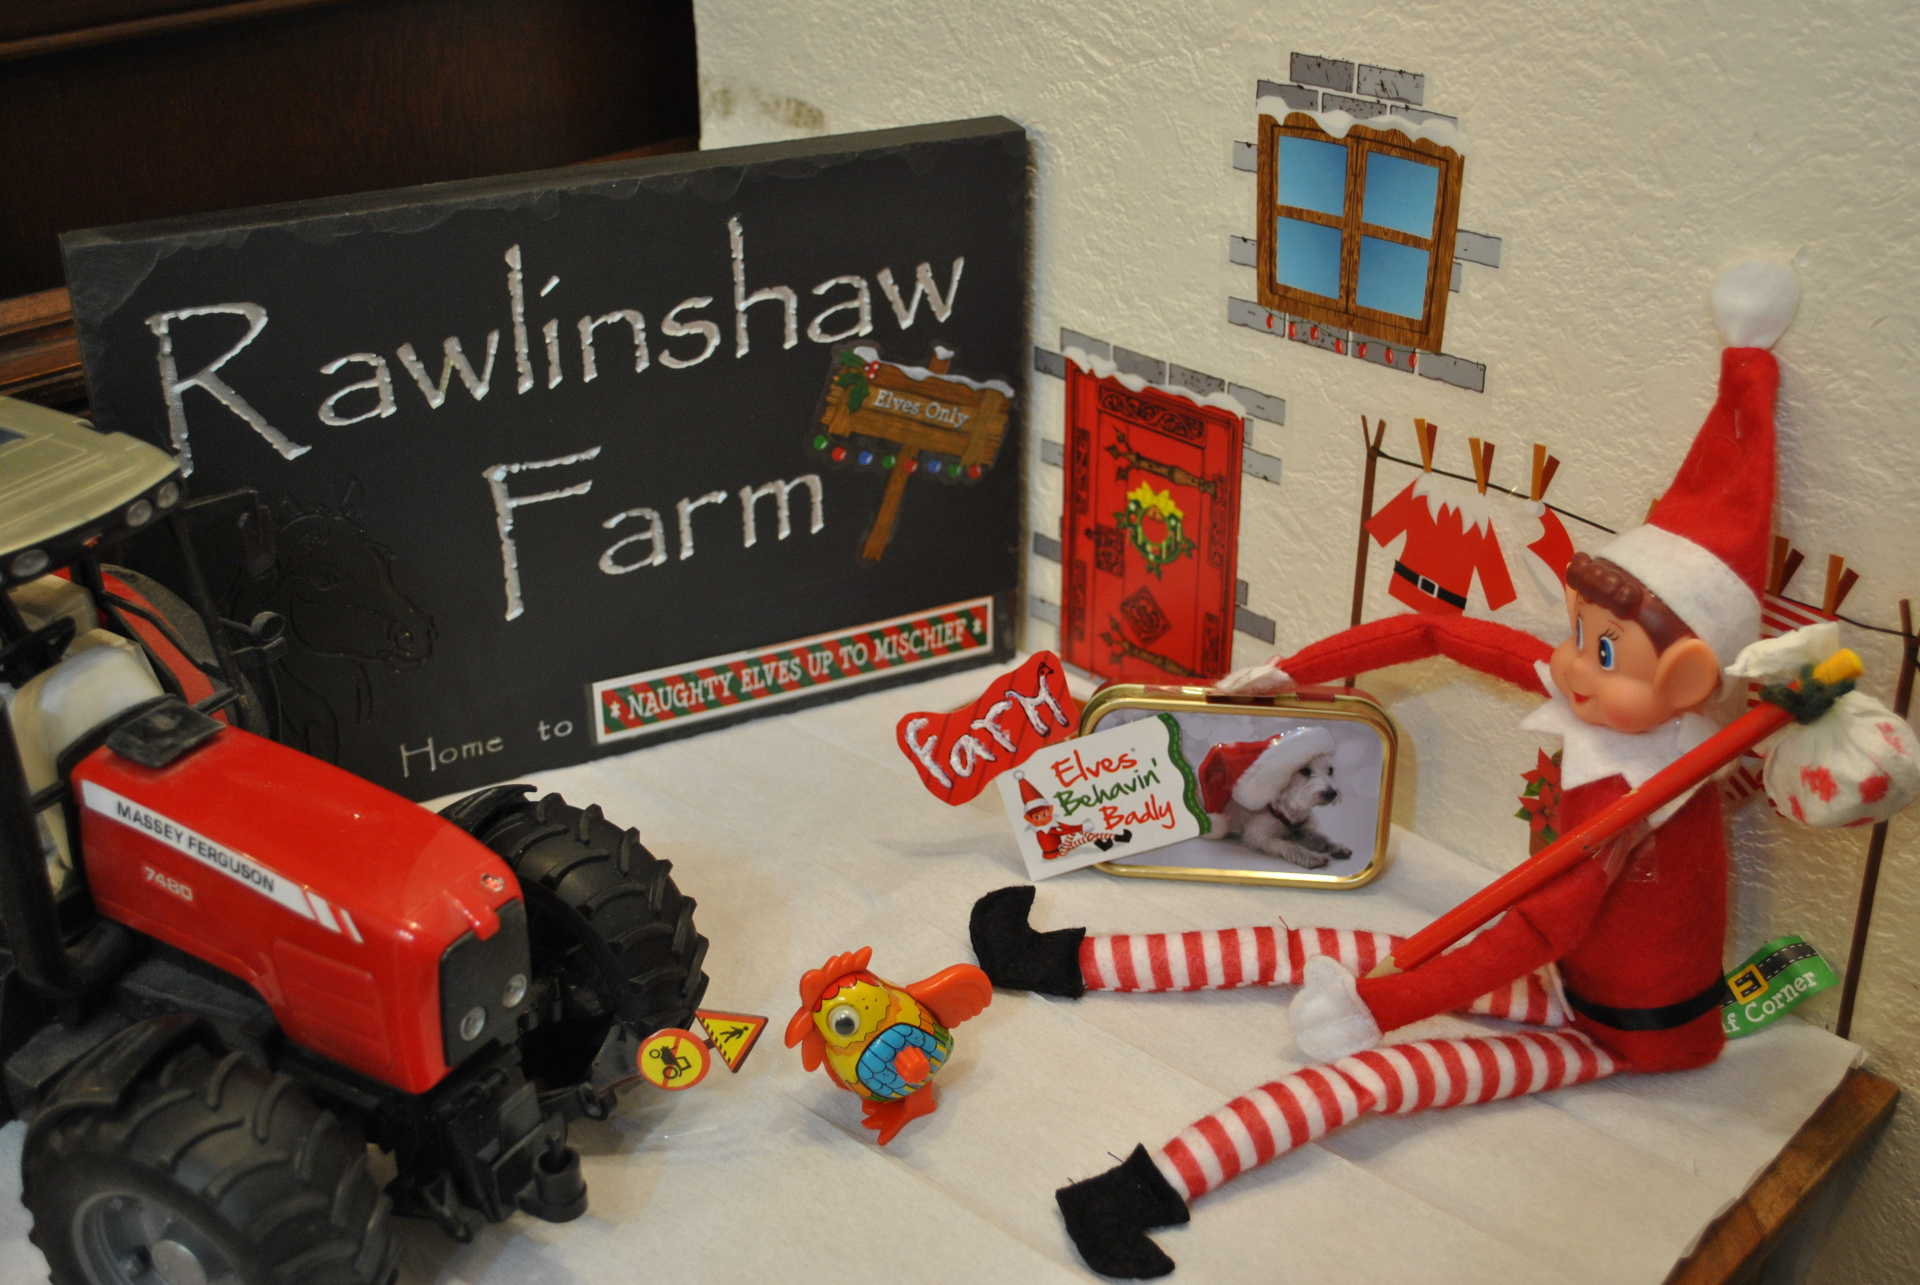 Arthur arrives at Rawlinshaw